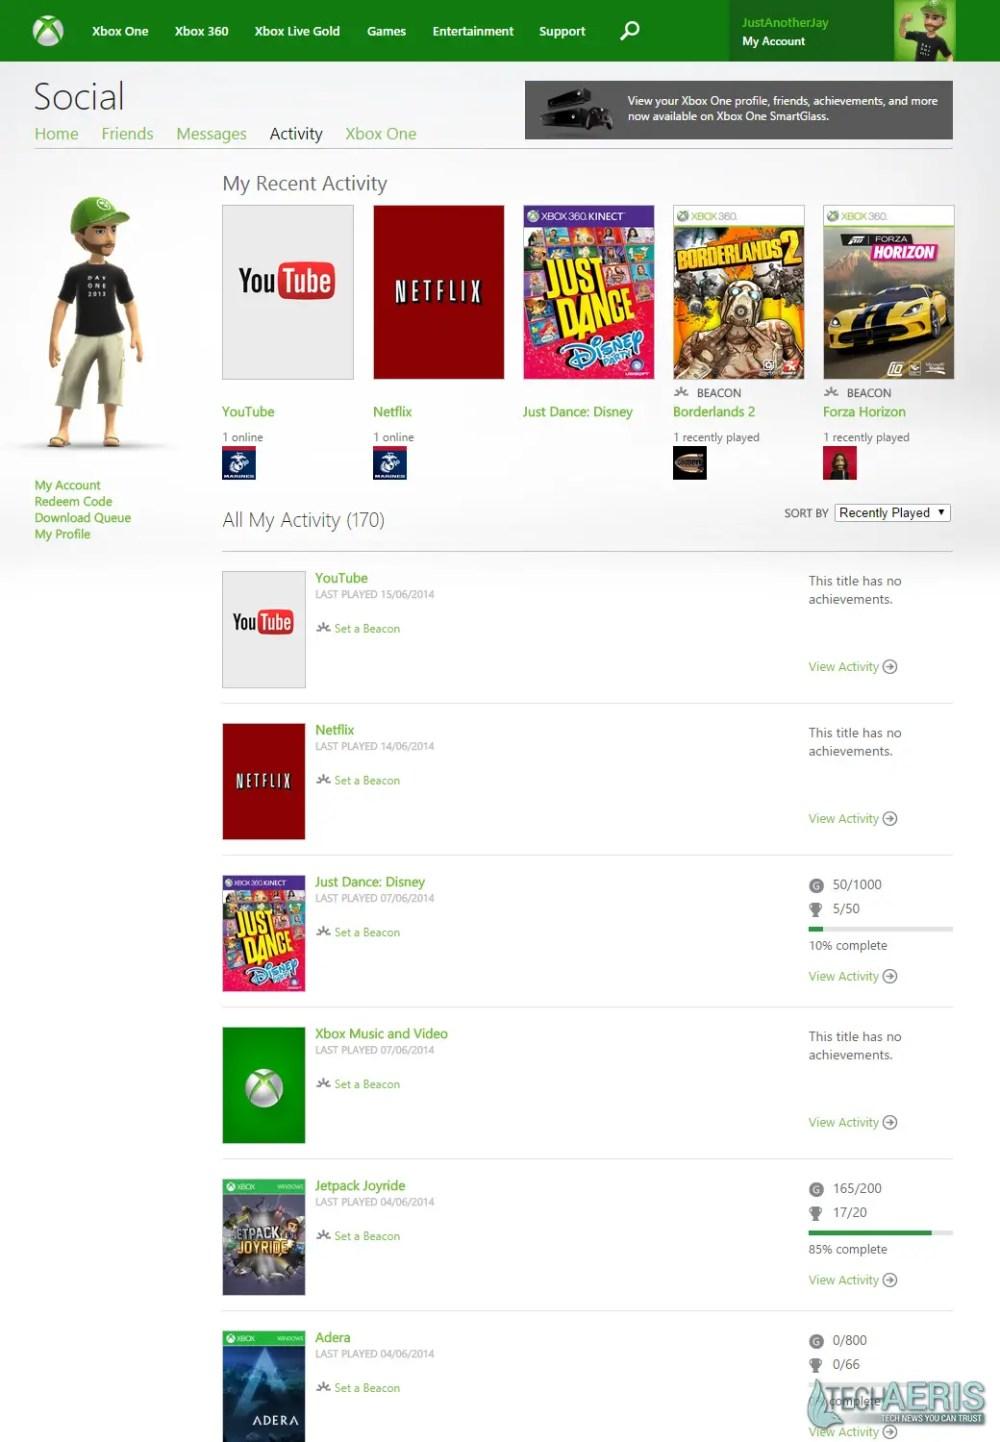 XBL Achievements Website Current Version - Overview Screenshot